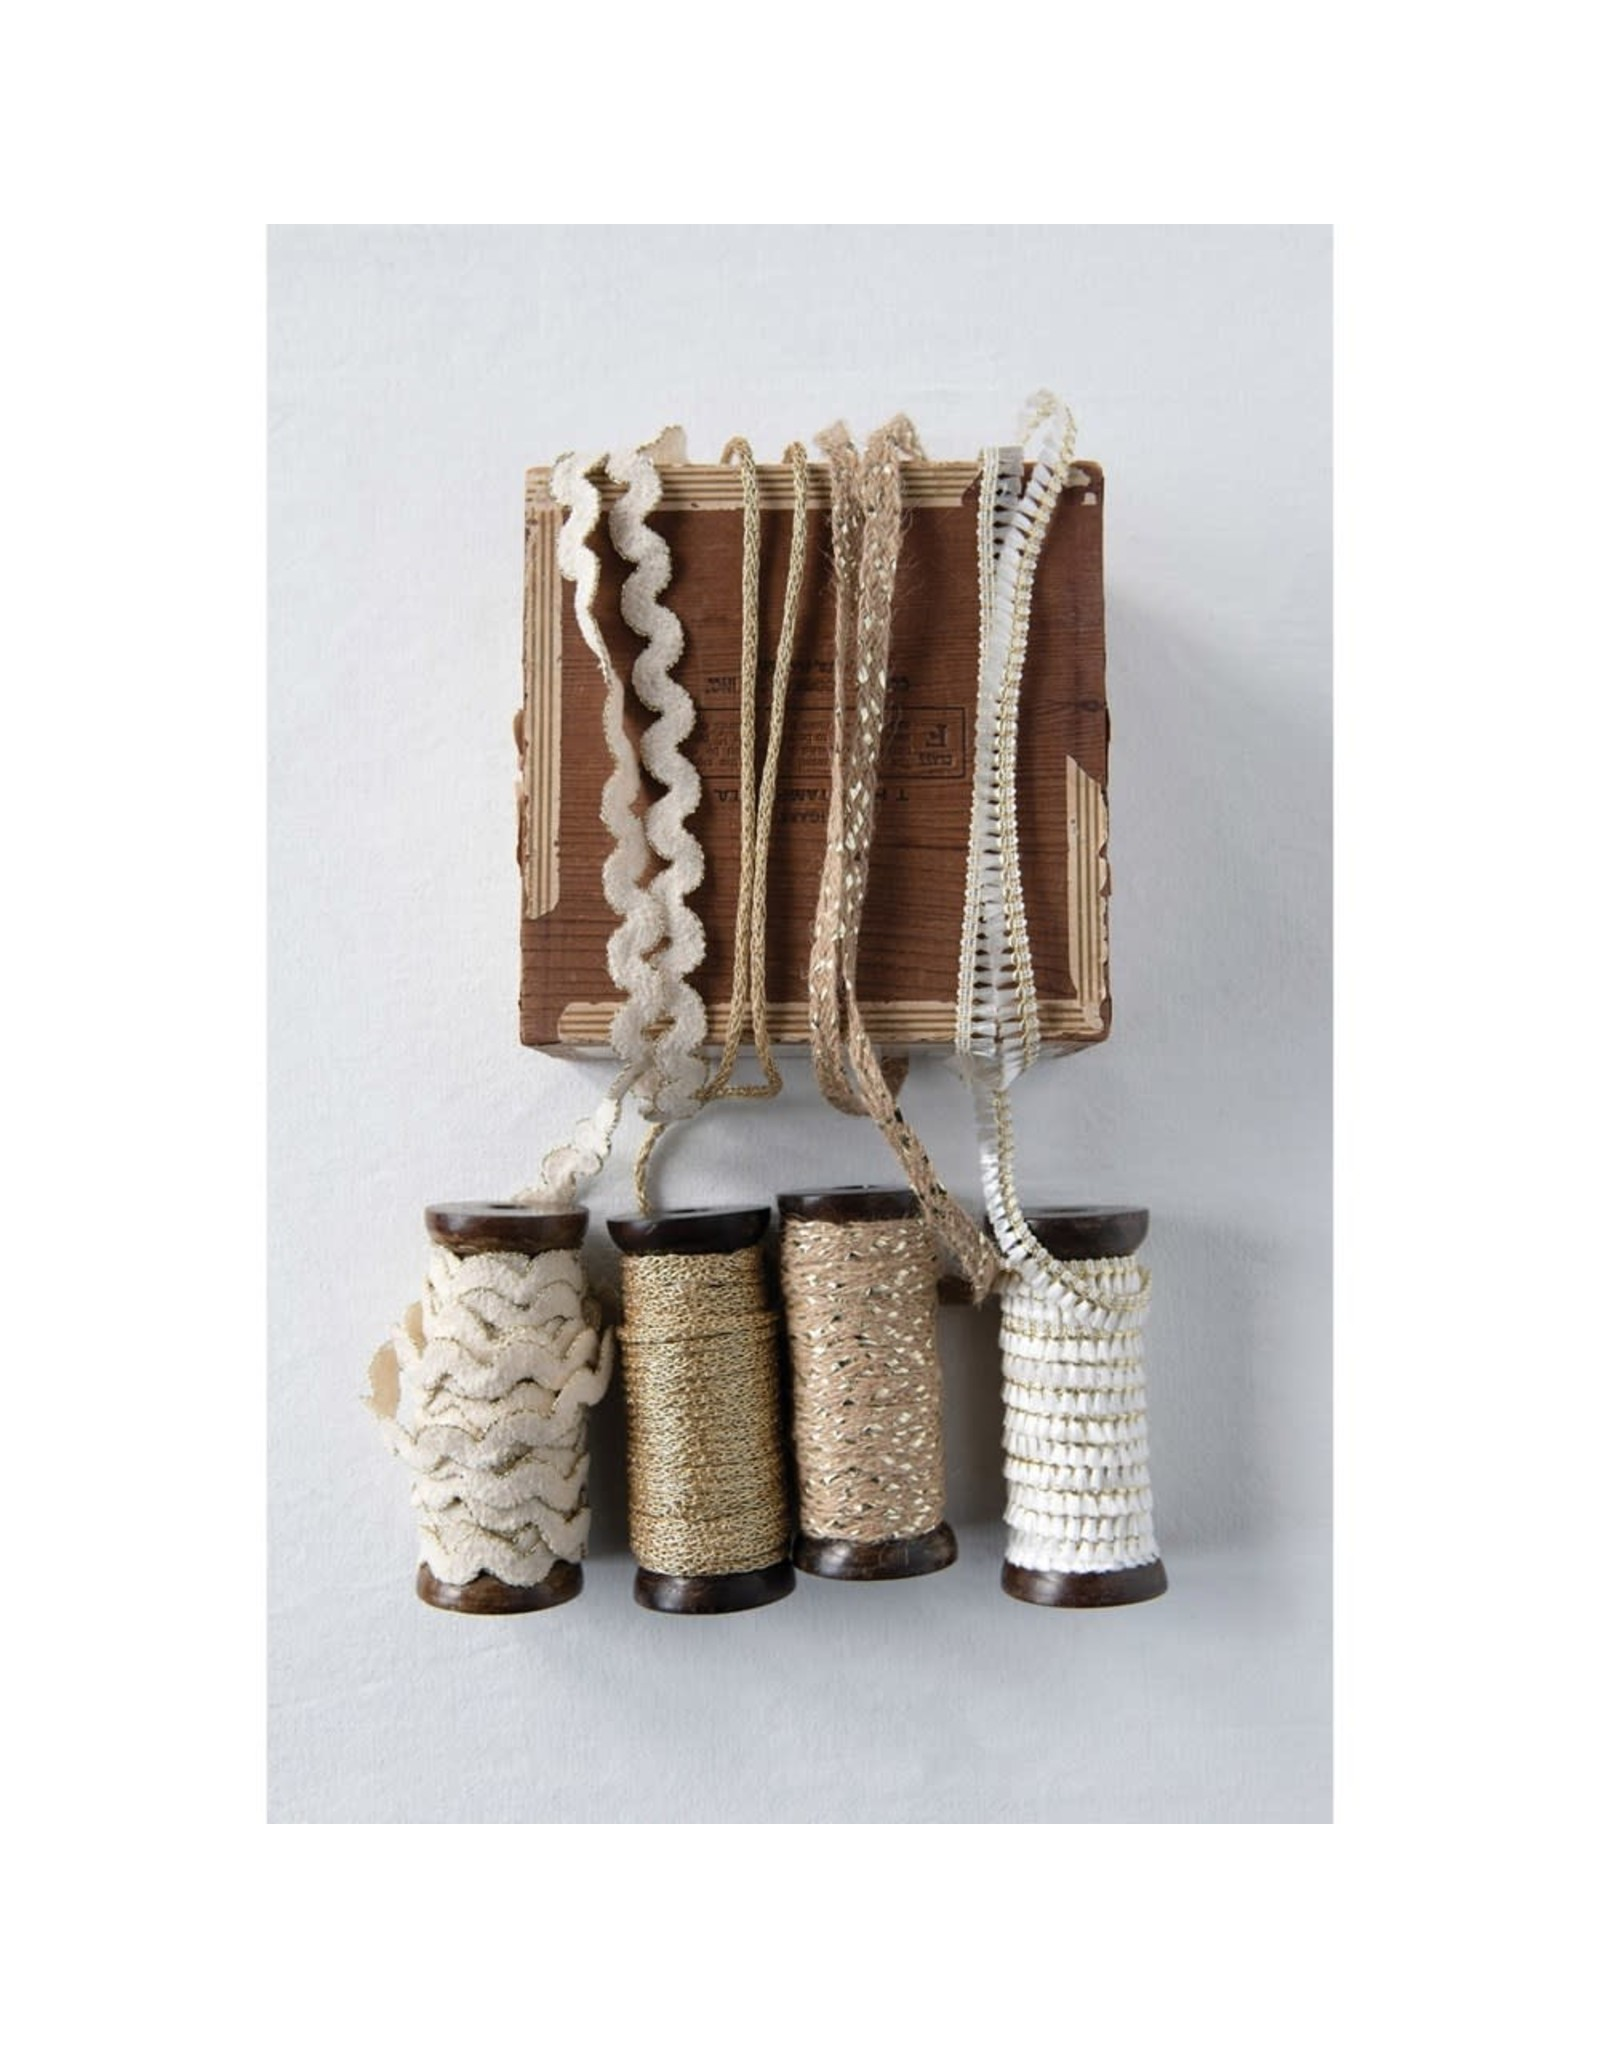 Creative Co-op Metallic Ribbon Spools - 10 yd - Cream Fringe